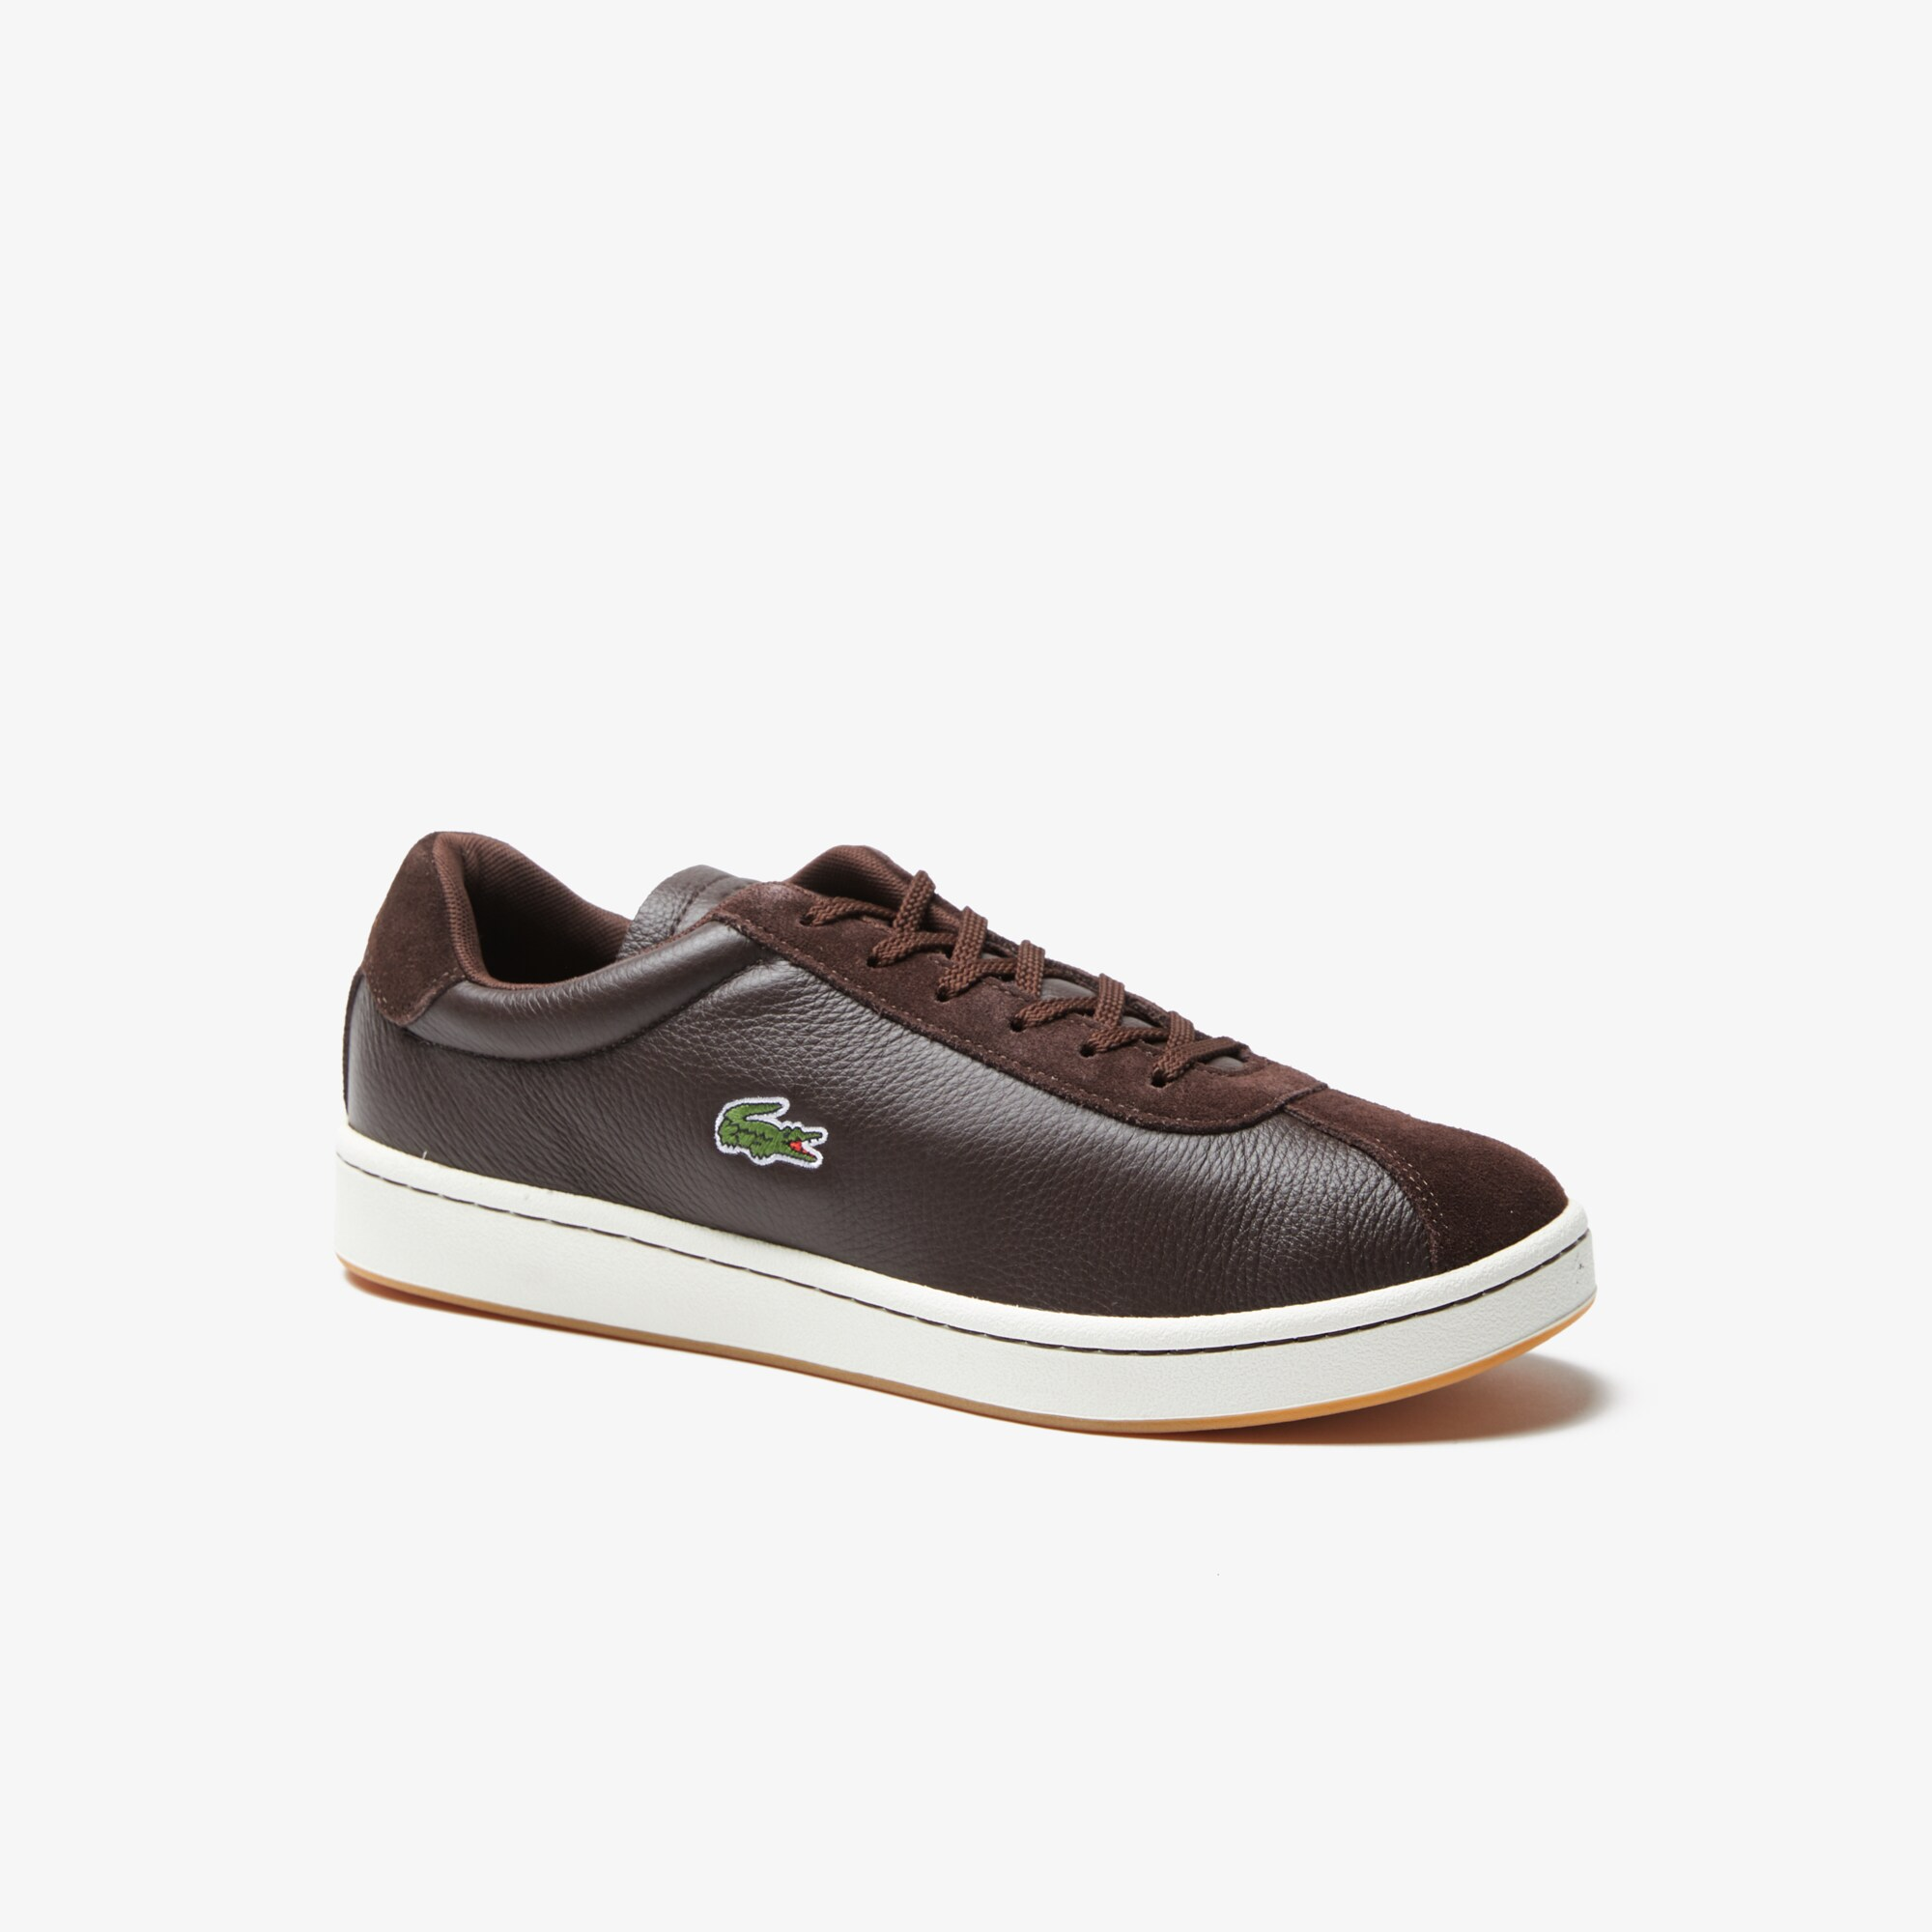 eea59c574 أحذية LACOSTE للرجال: أحذية رياضية وأحذية طويلة الساق | LACOSTE